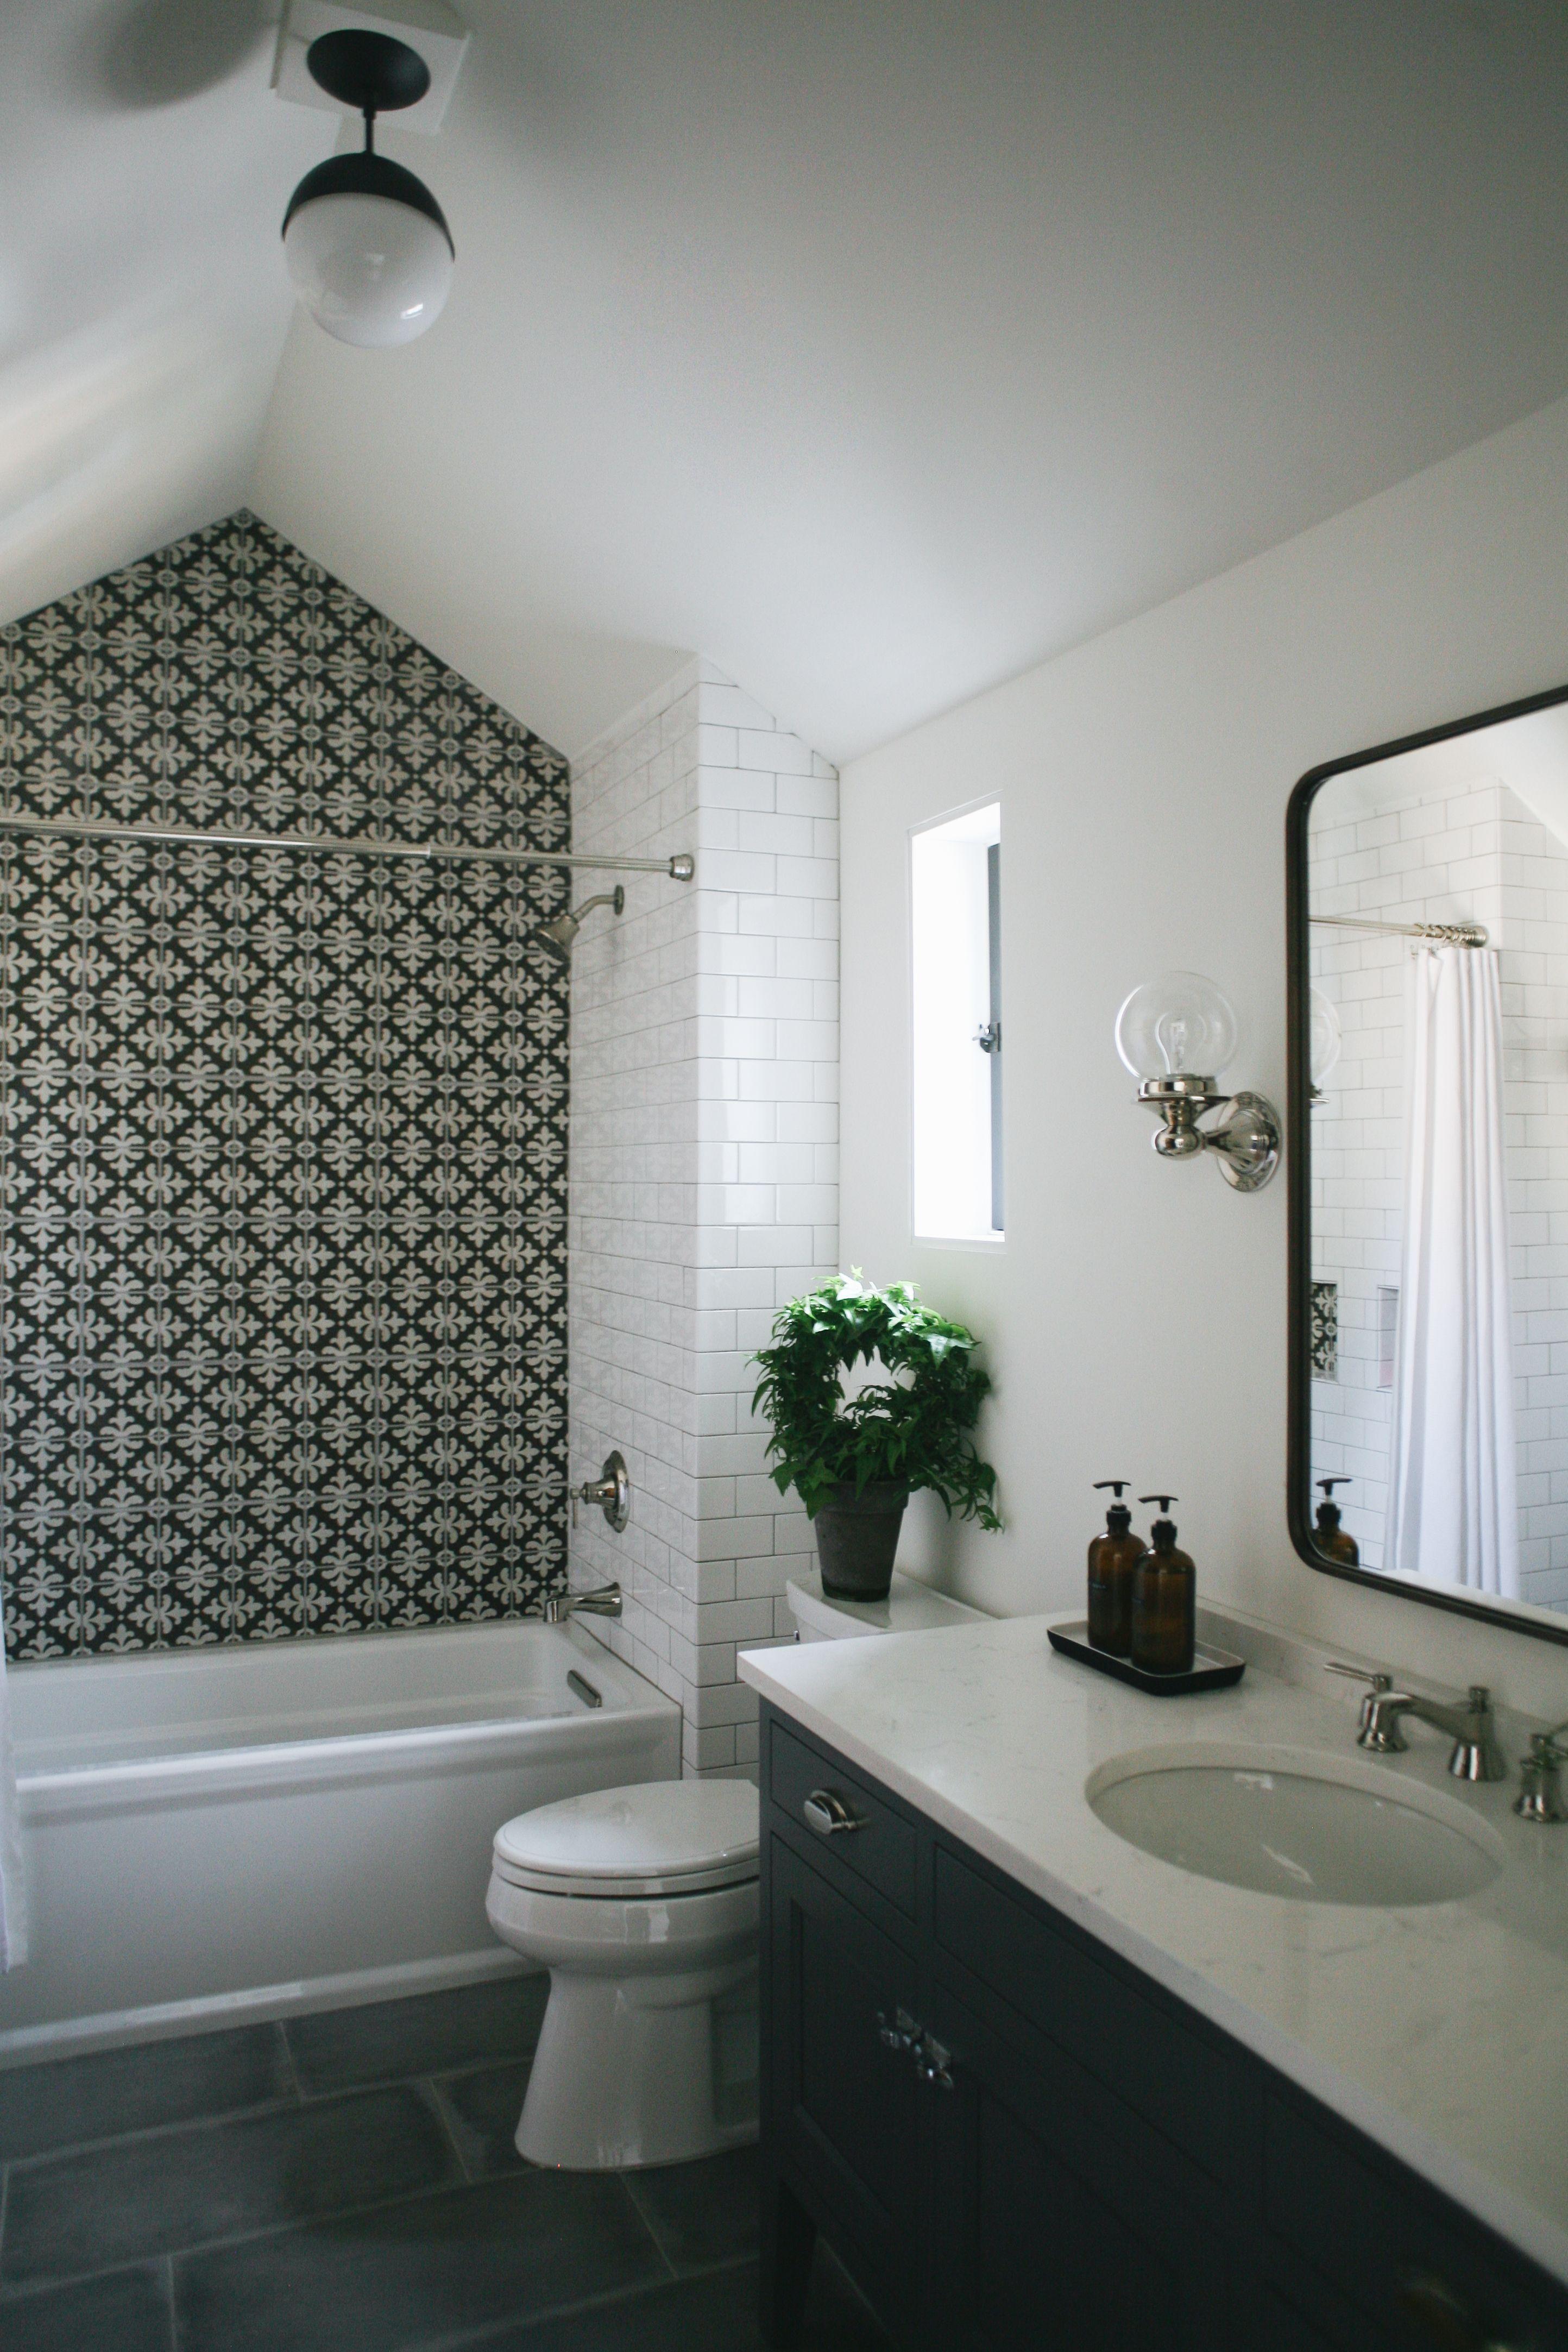 Designyourbathroomlayout Small Bathroom Makeover Bathroom Makeover Bathroom Interior Design